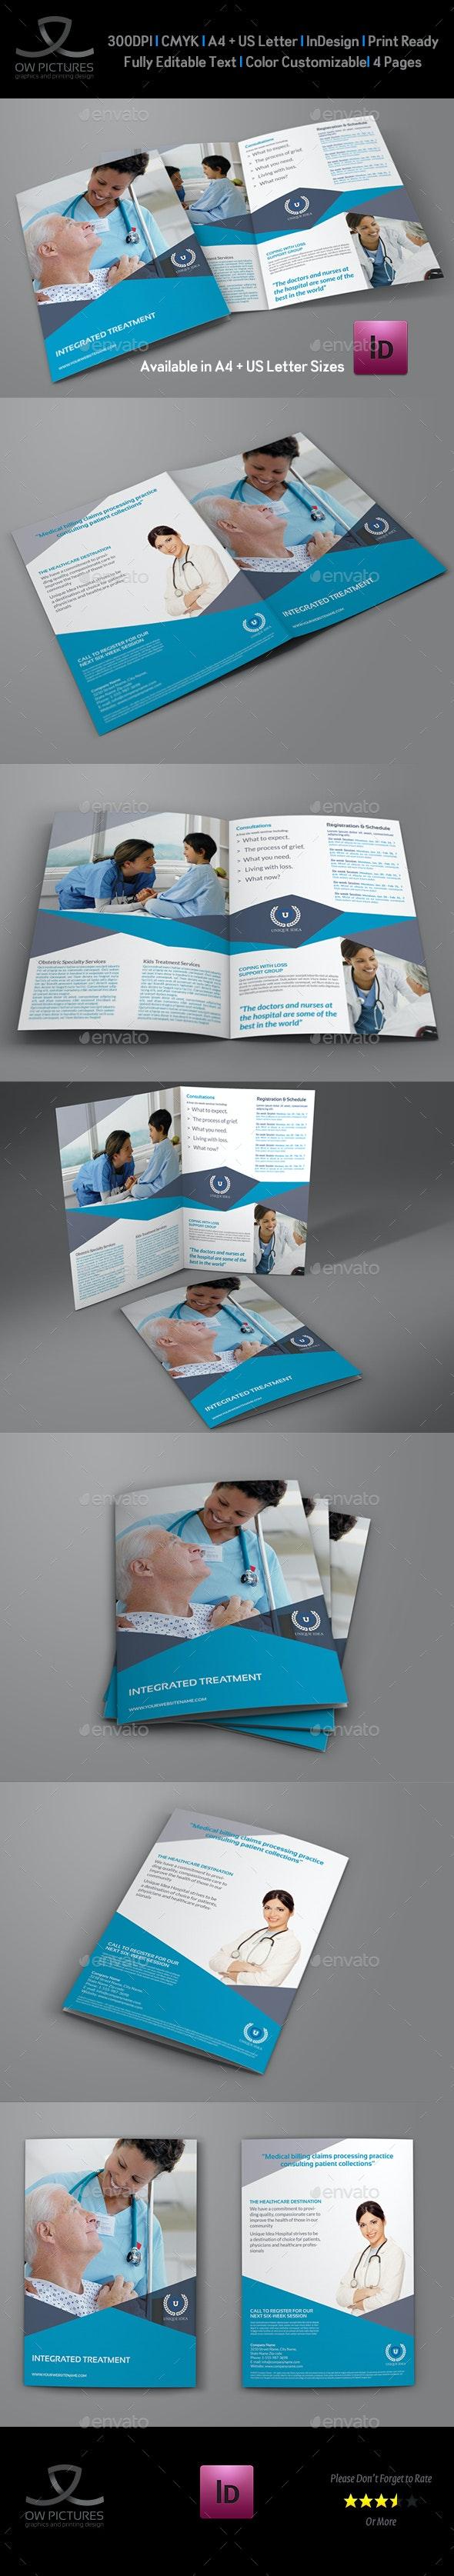 Medical Care Bi-Fold Brochure Template - Brochures Print Templates